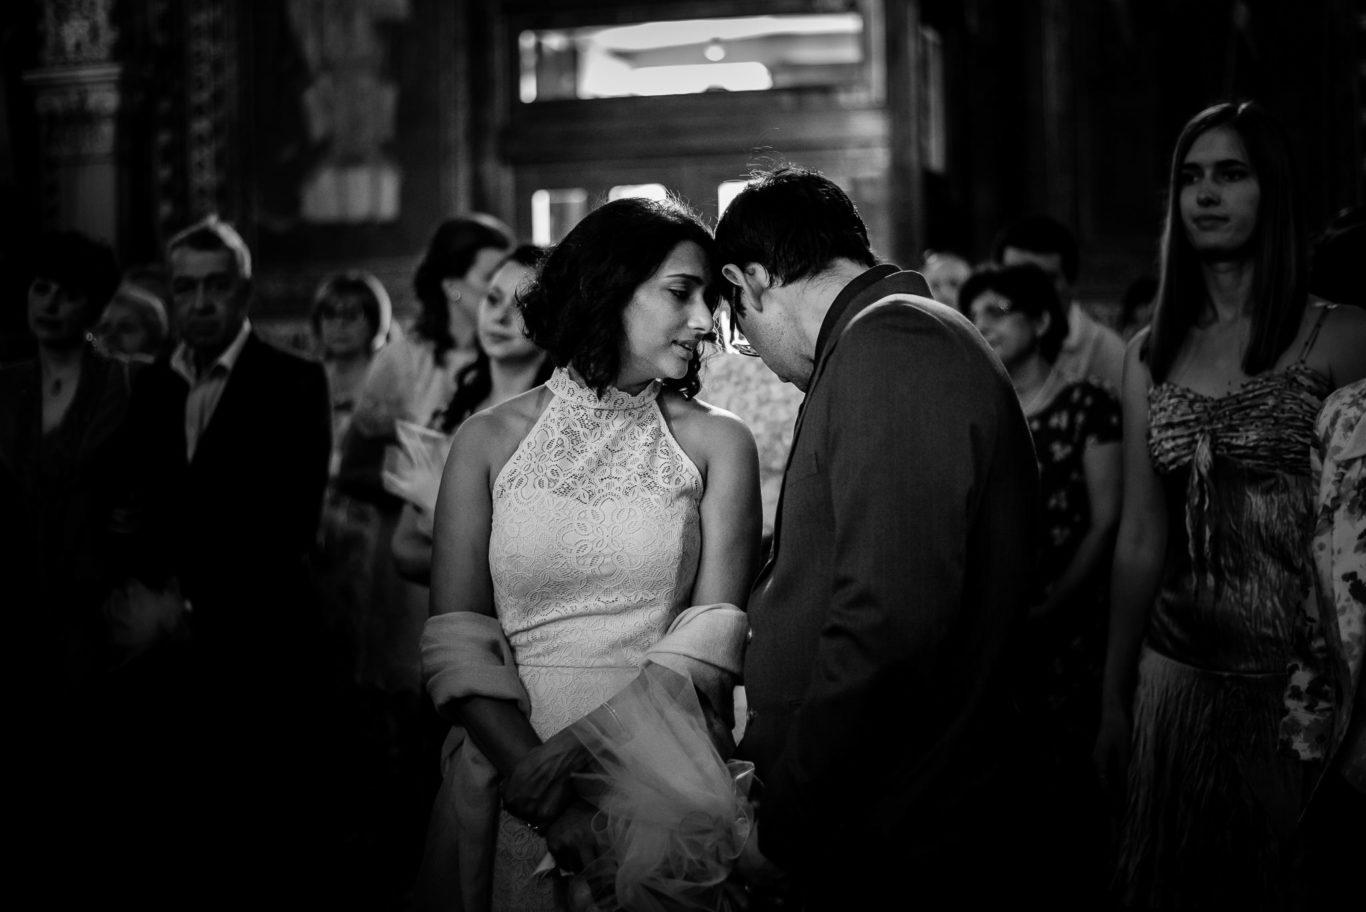 0510-Fotografie-nunta-Simona-Valentin-fotograf-Ciprian-Dumitrescu-DSC_1833